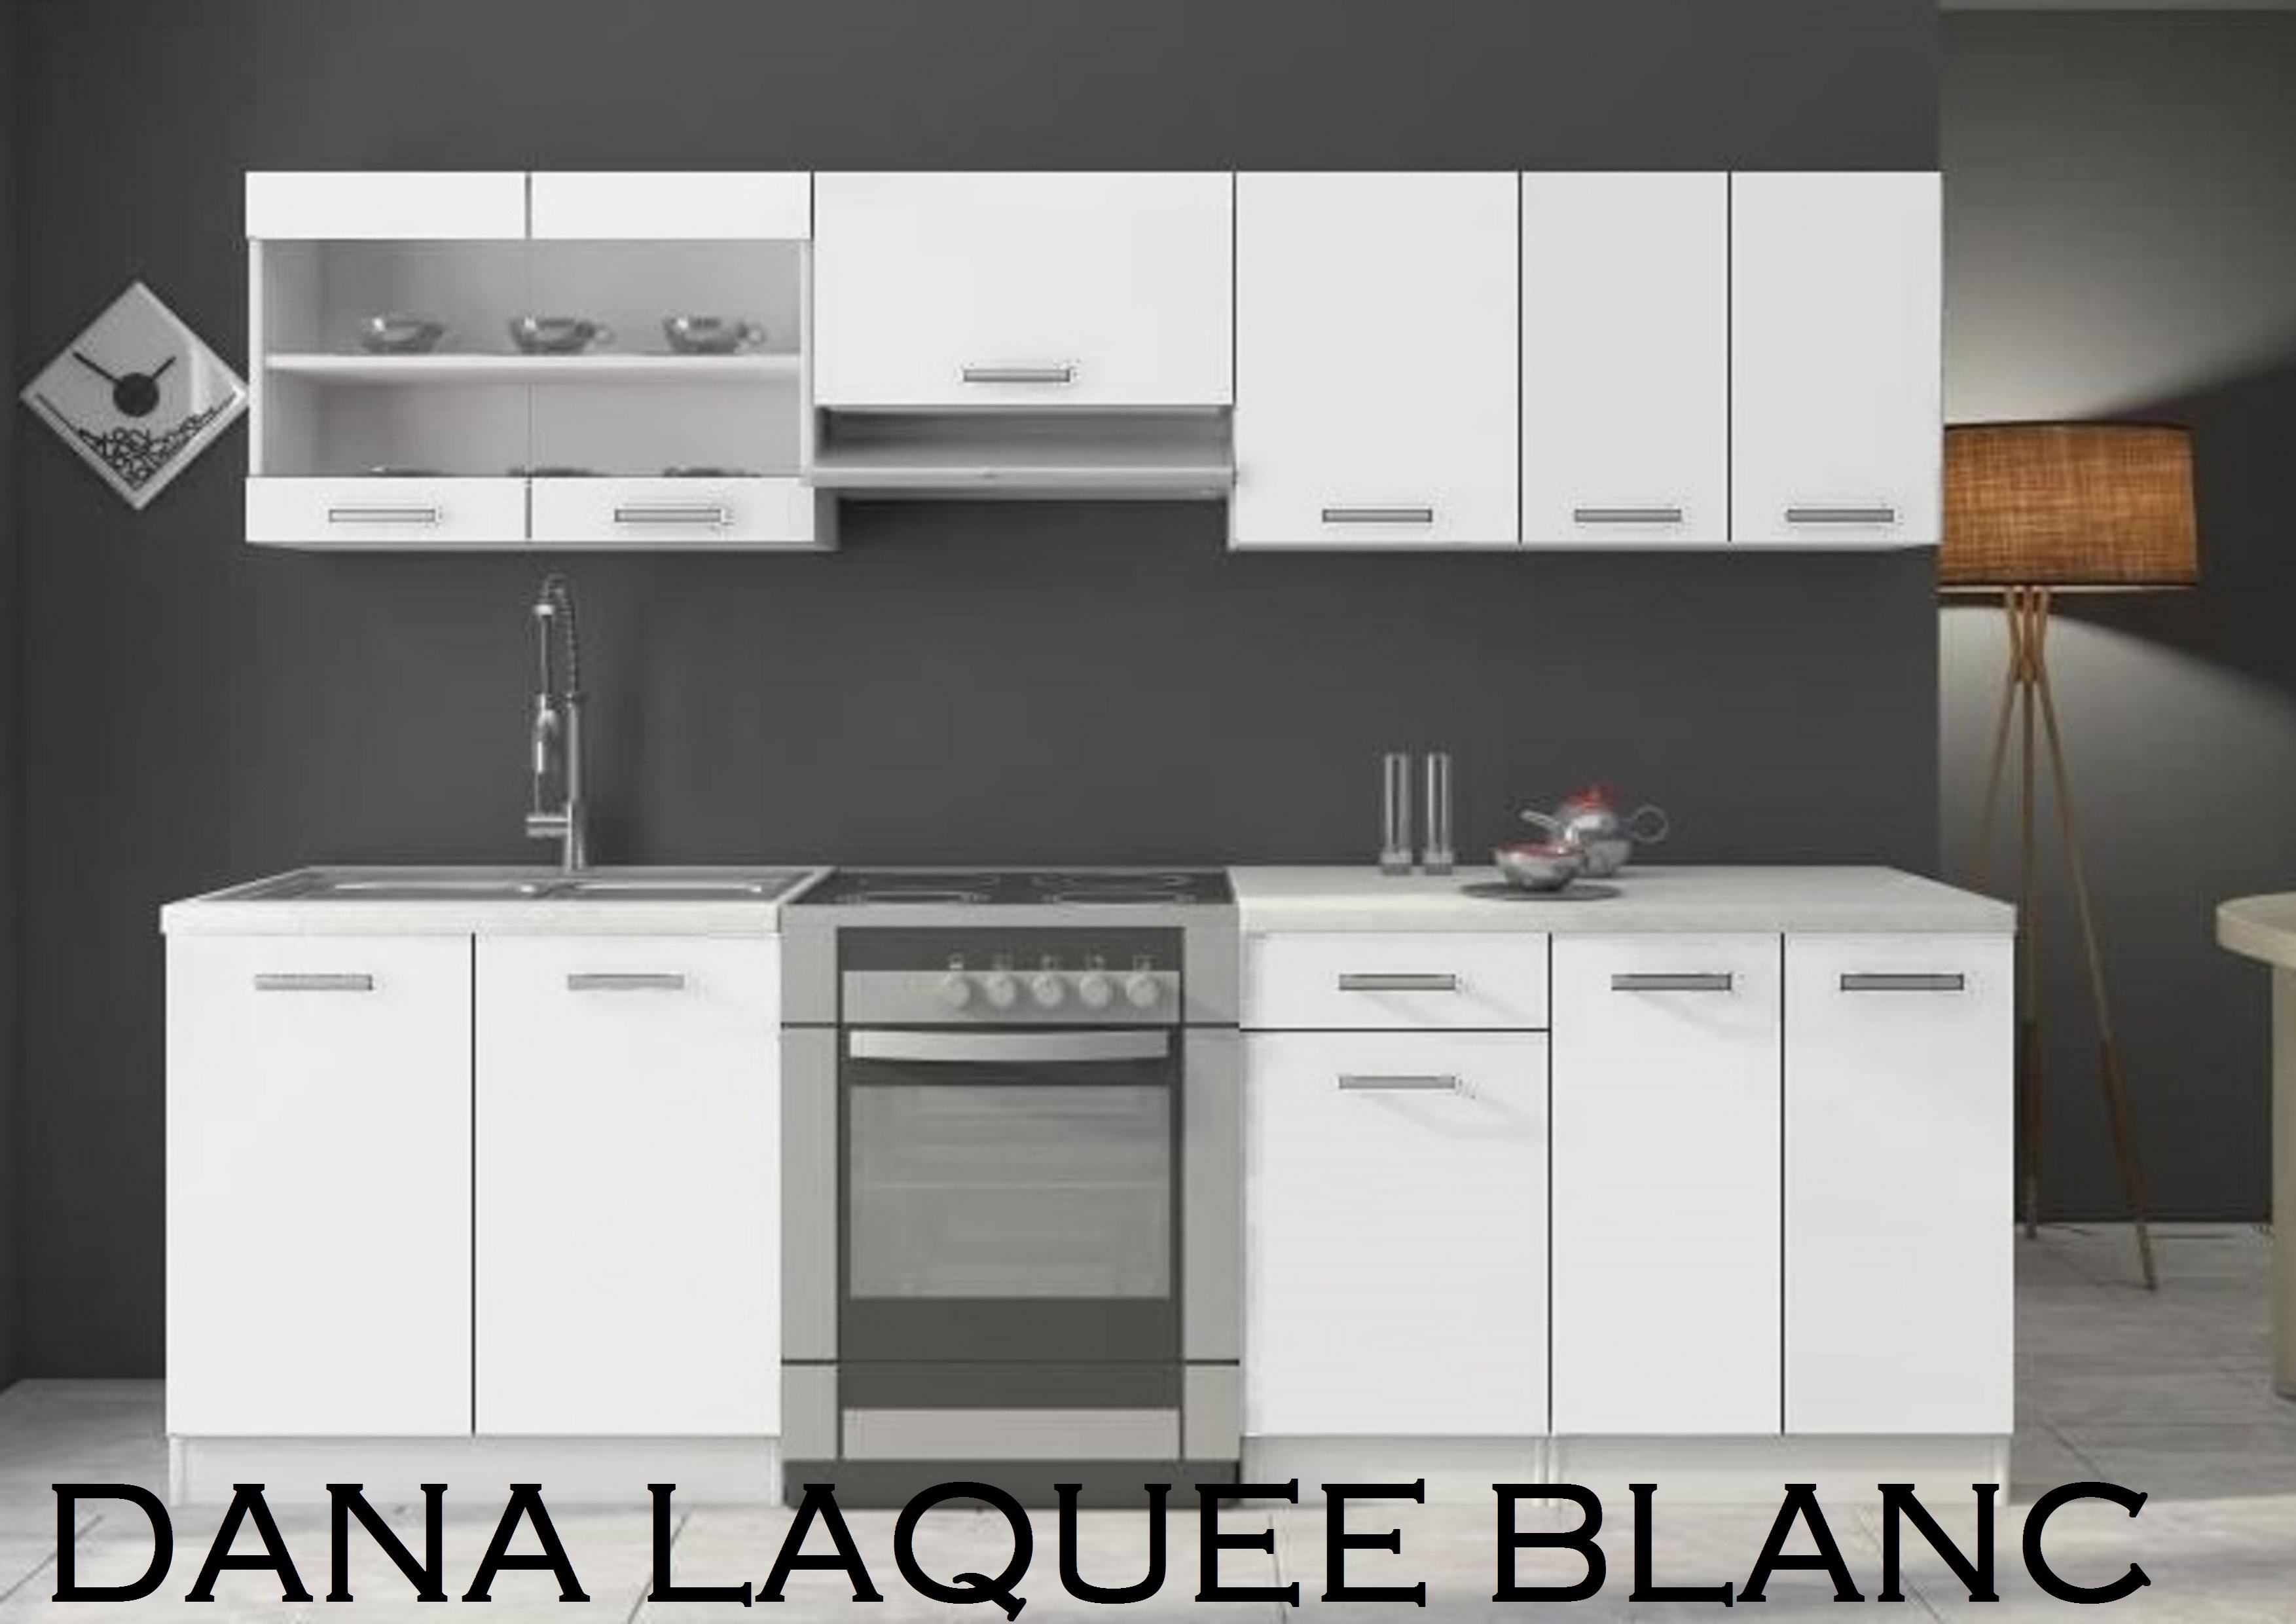 kit dana nkl meuble wassa et deco. Black Bedroom Furniture Sets. Home Design Ideas